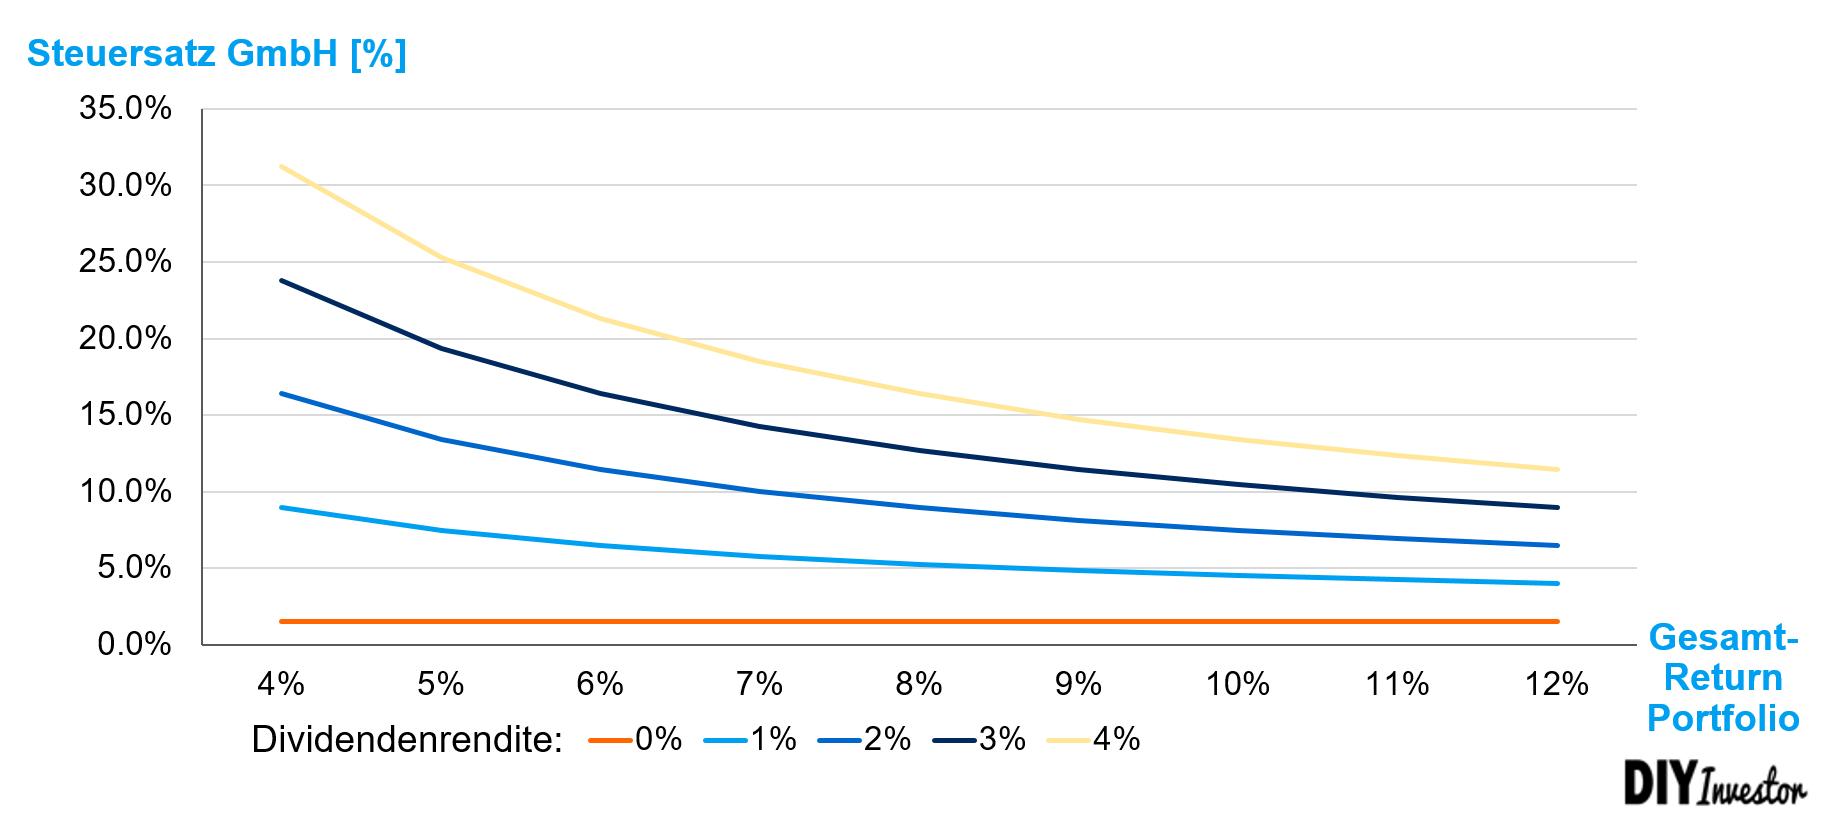 Besteuerung VV GmbH bei verschiedenen Dividenden_Renditen